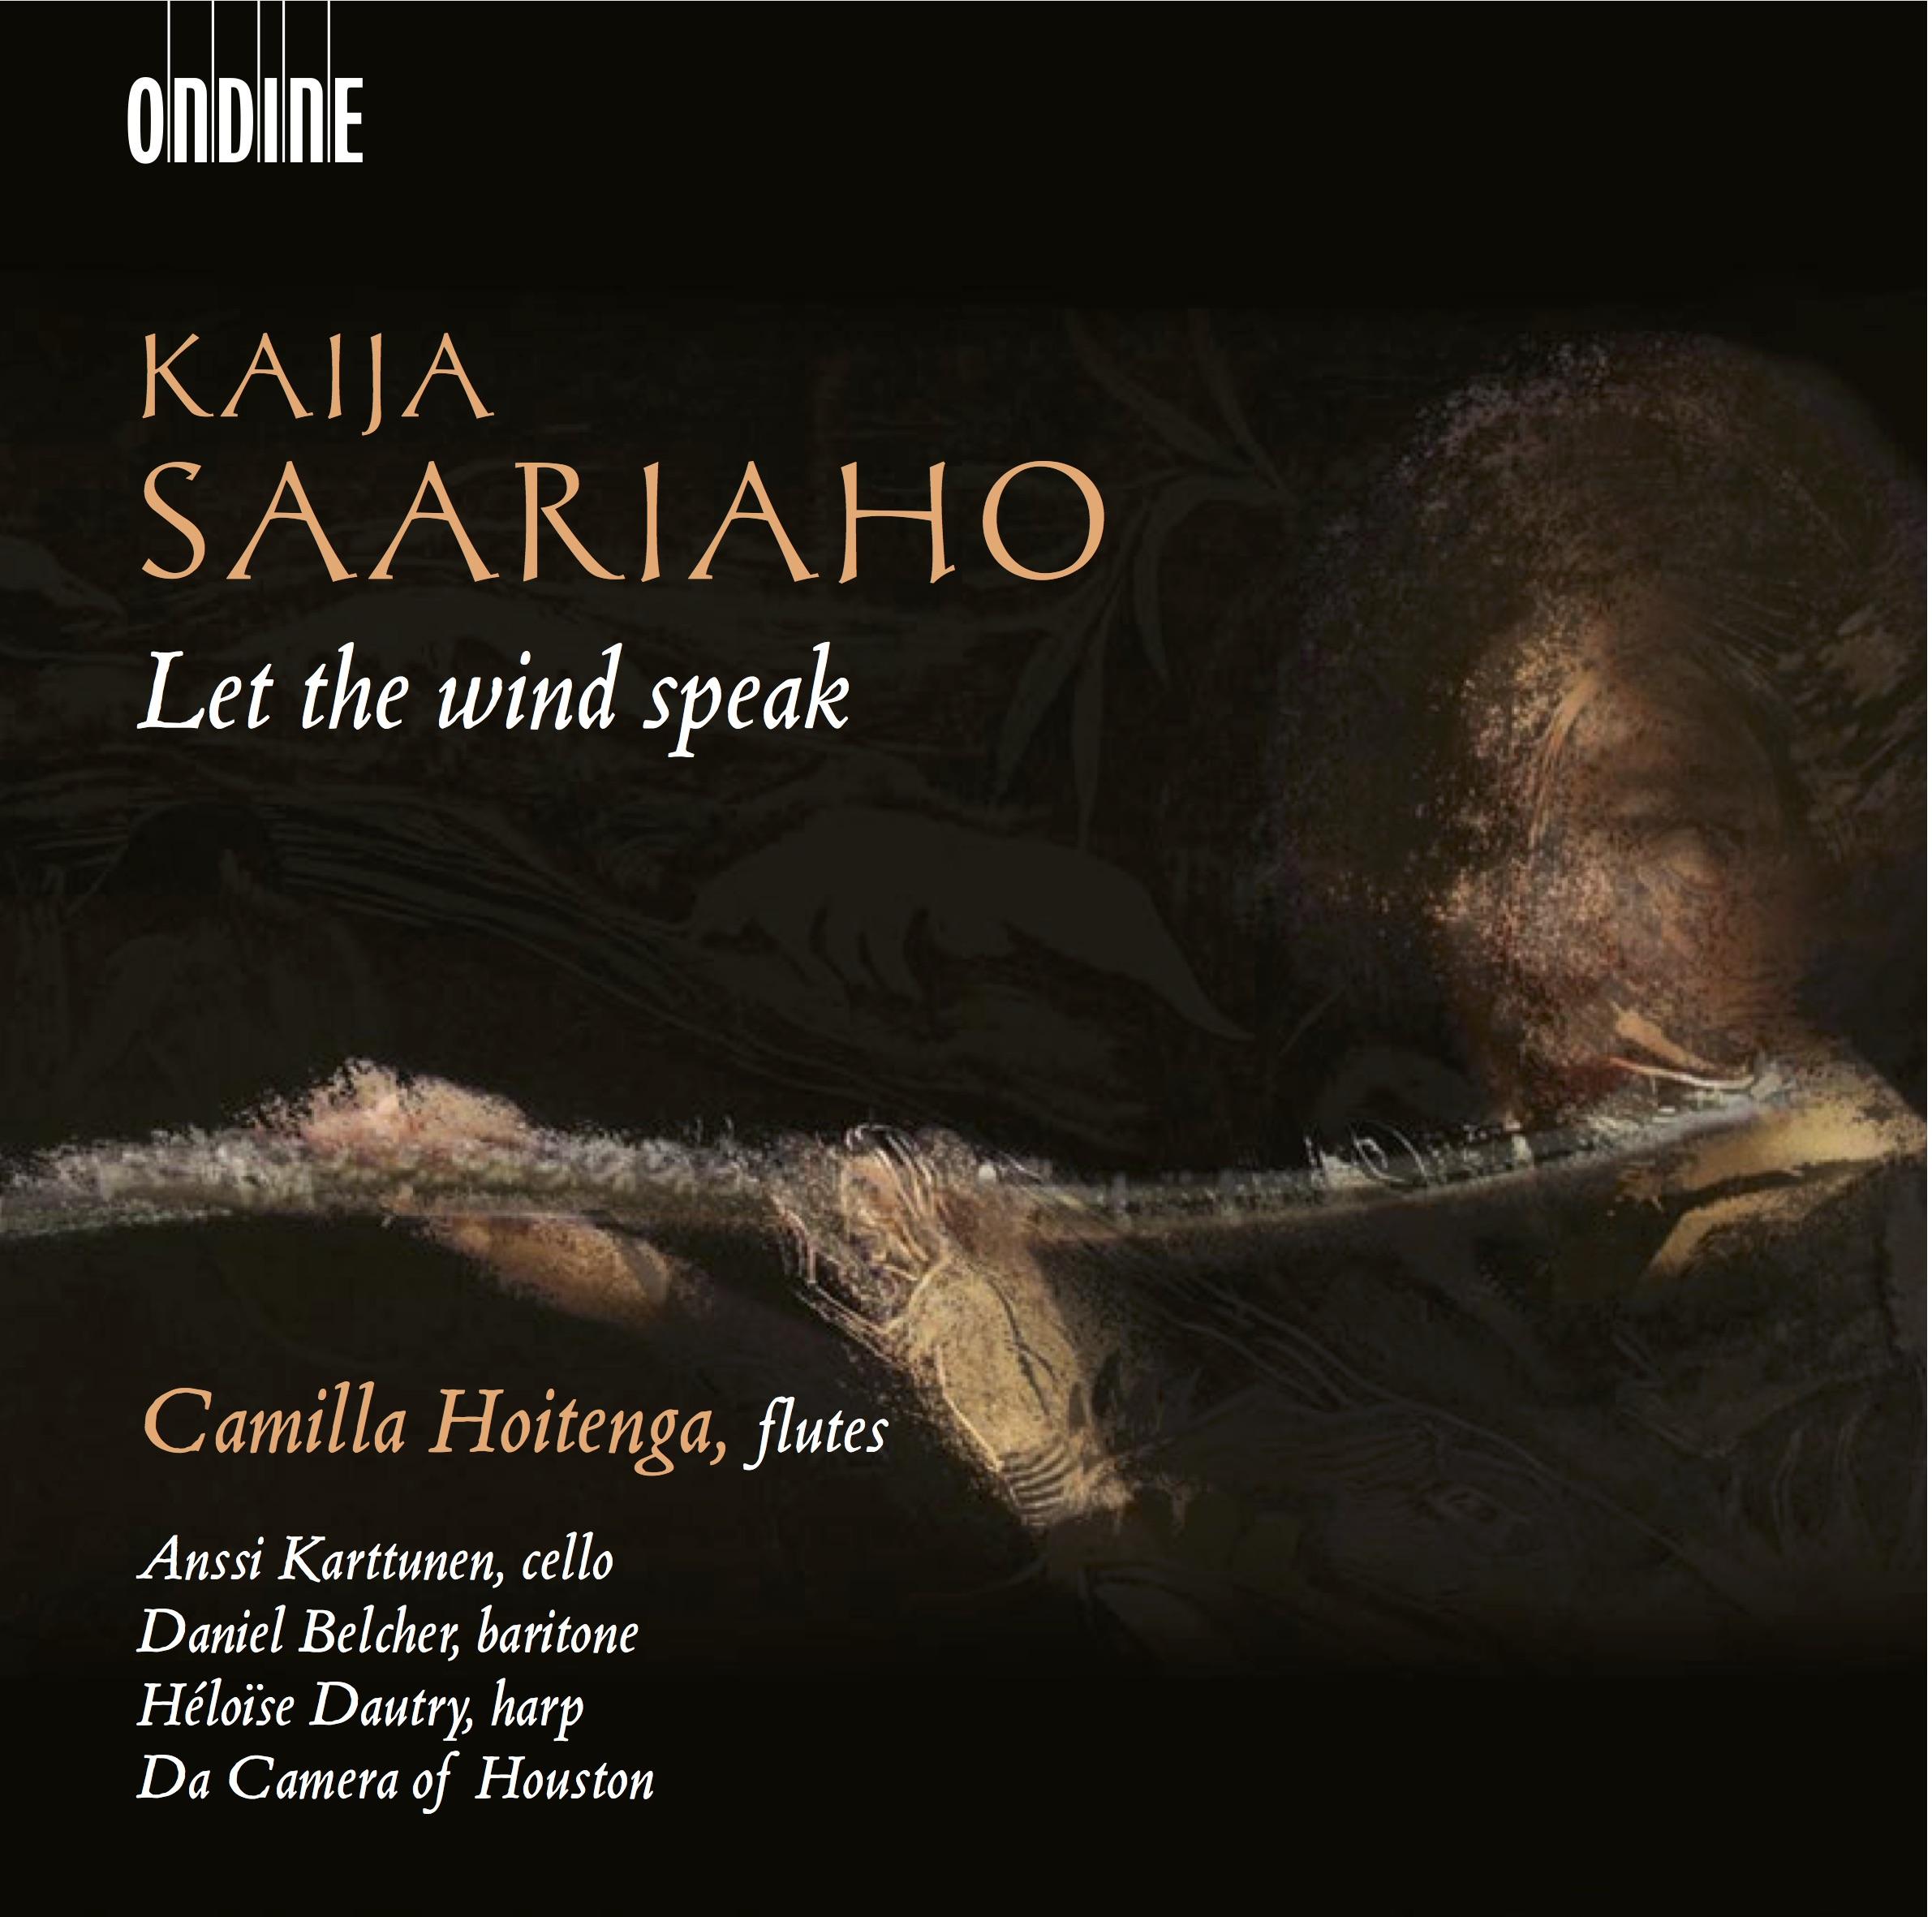 Let the Wind Speak  by  Kaija Saariaho   Camilla Hoitenga  (flute)  Daniel Belcher  (baritone)  Anssi Karttunen  (cello)  Héloïse Dautry  (harp)  Da Camera of Houston  (Ondine, December 2015)